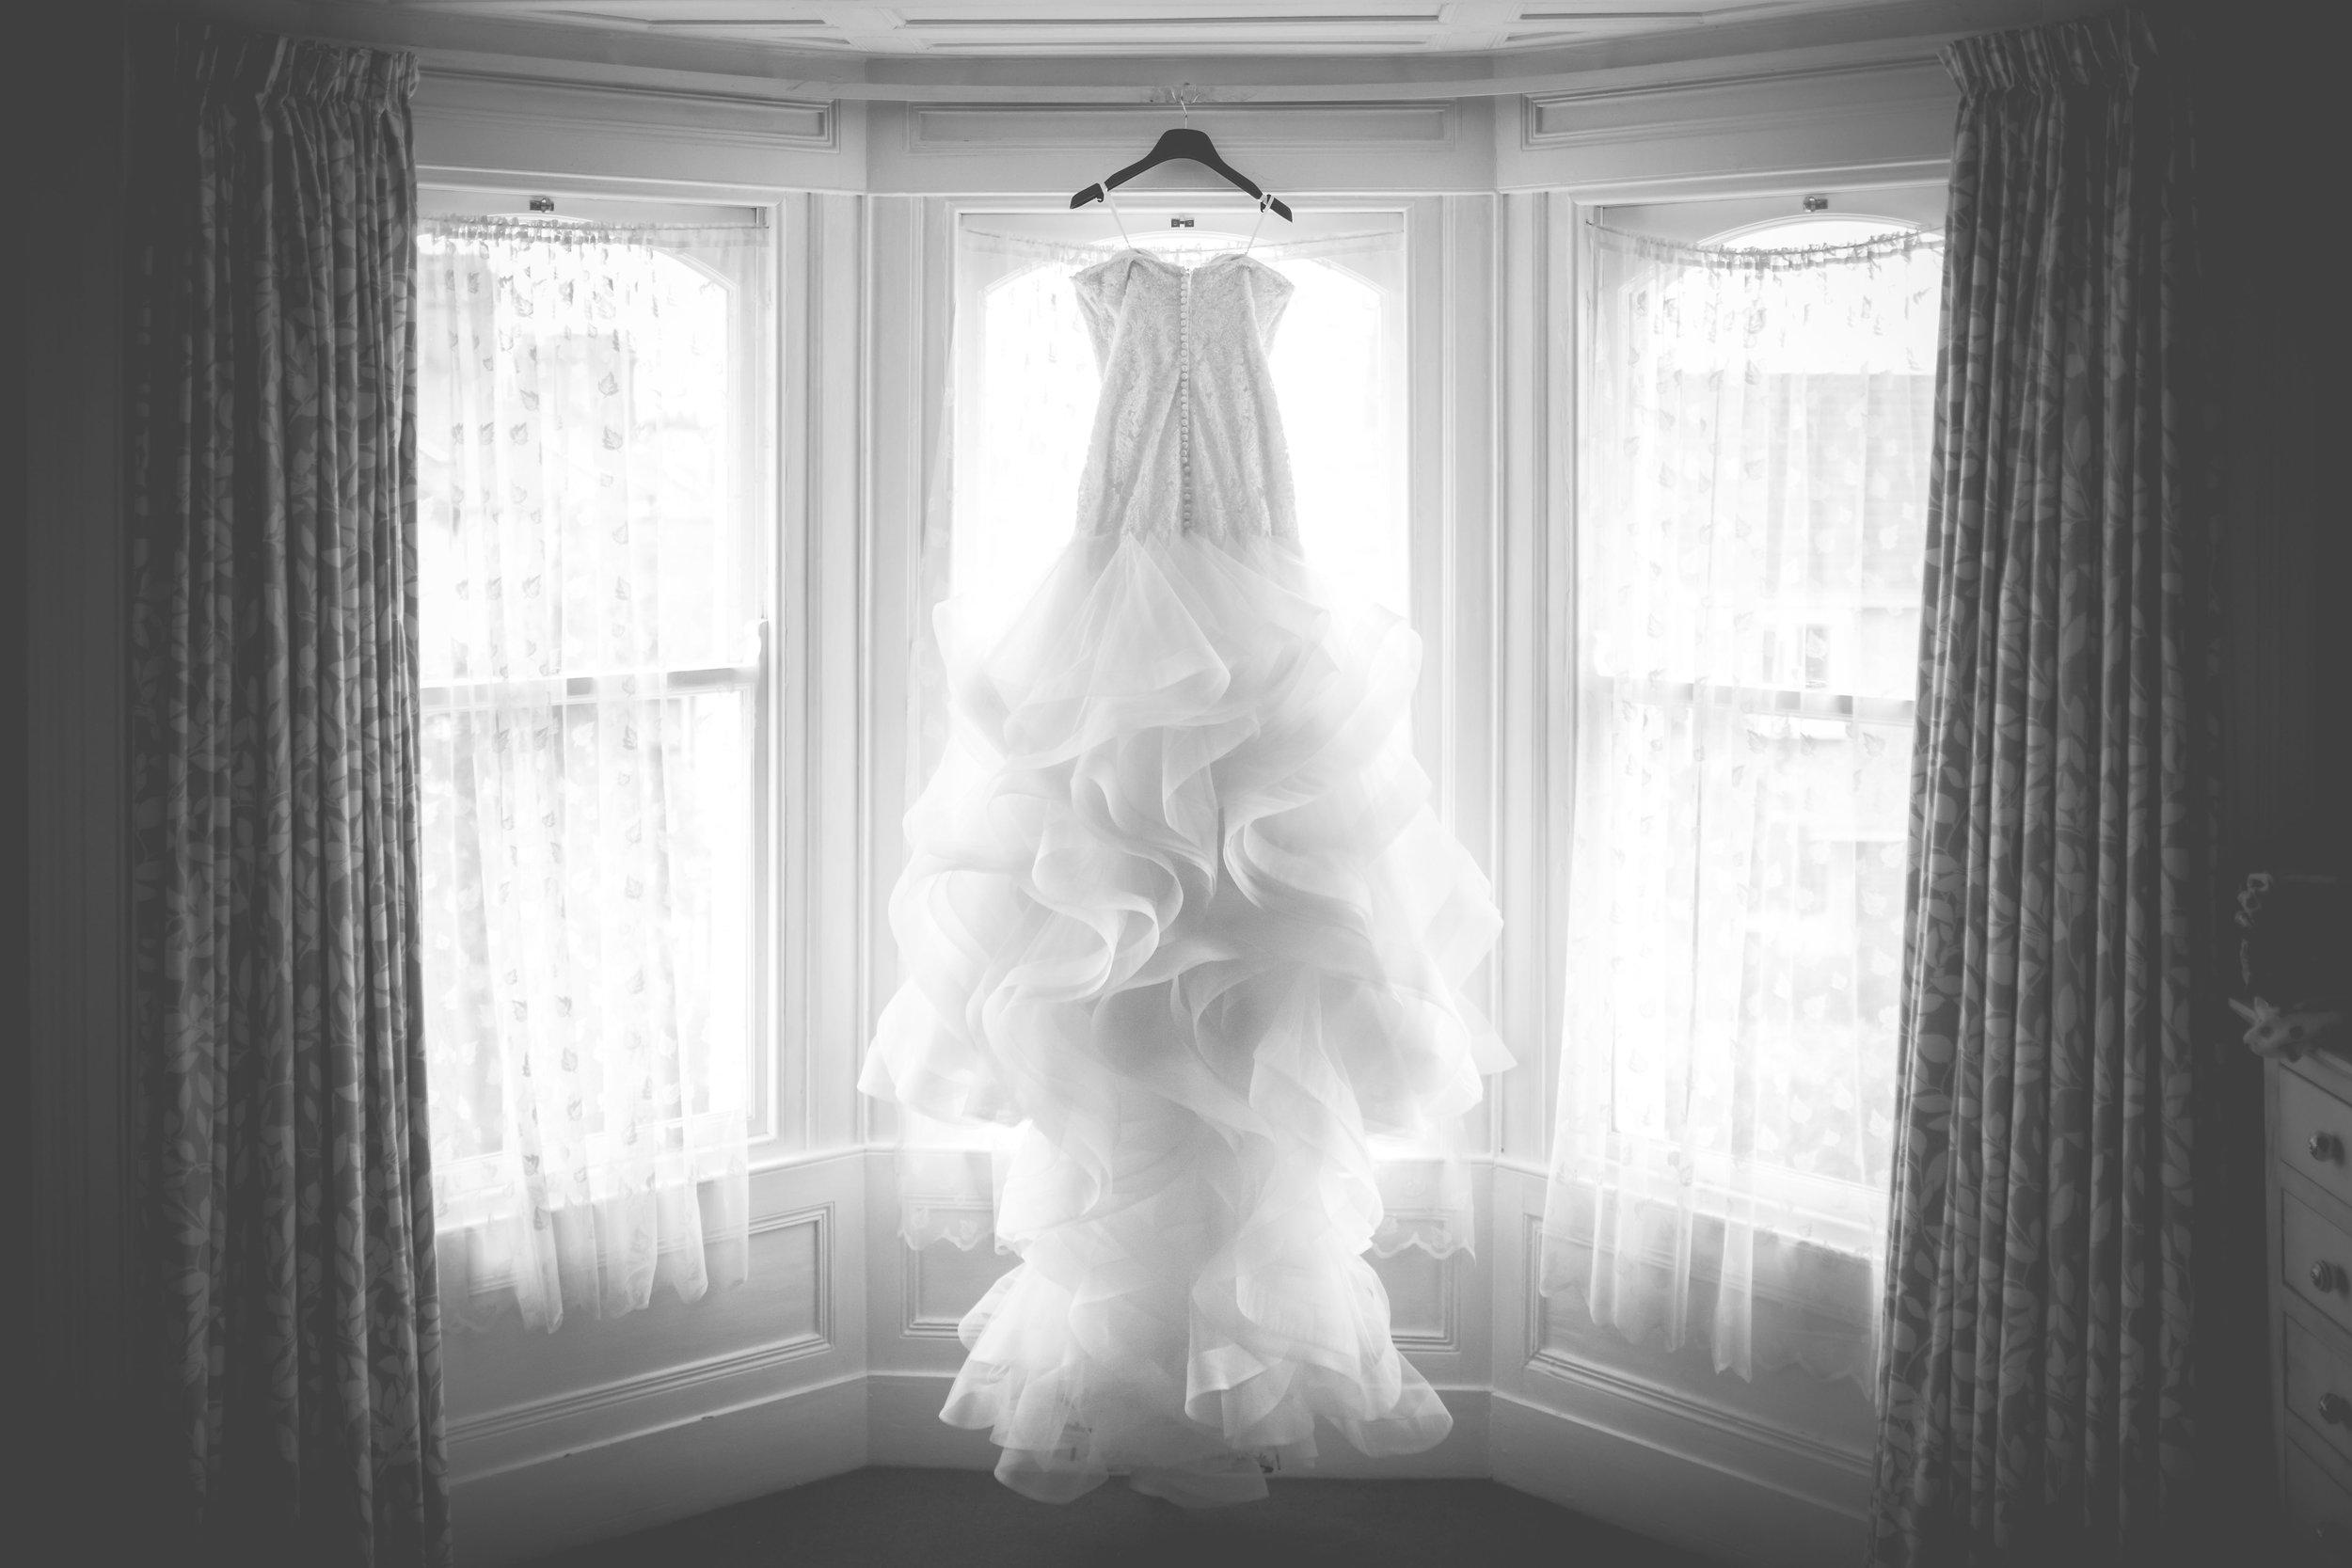 Northern Ireland Wedding Photographer | Brian McEwan Photography | Affordable Wedding Photography Throughout Antrim Down Armagh Tyrone Londonderry Derry Down Fermanagh -57.jpg